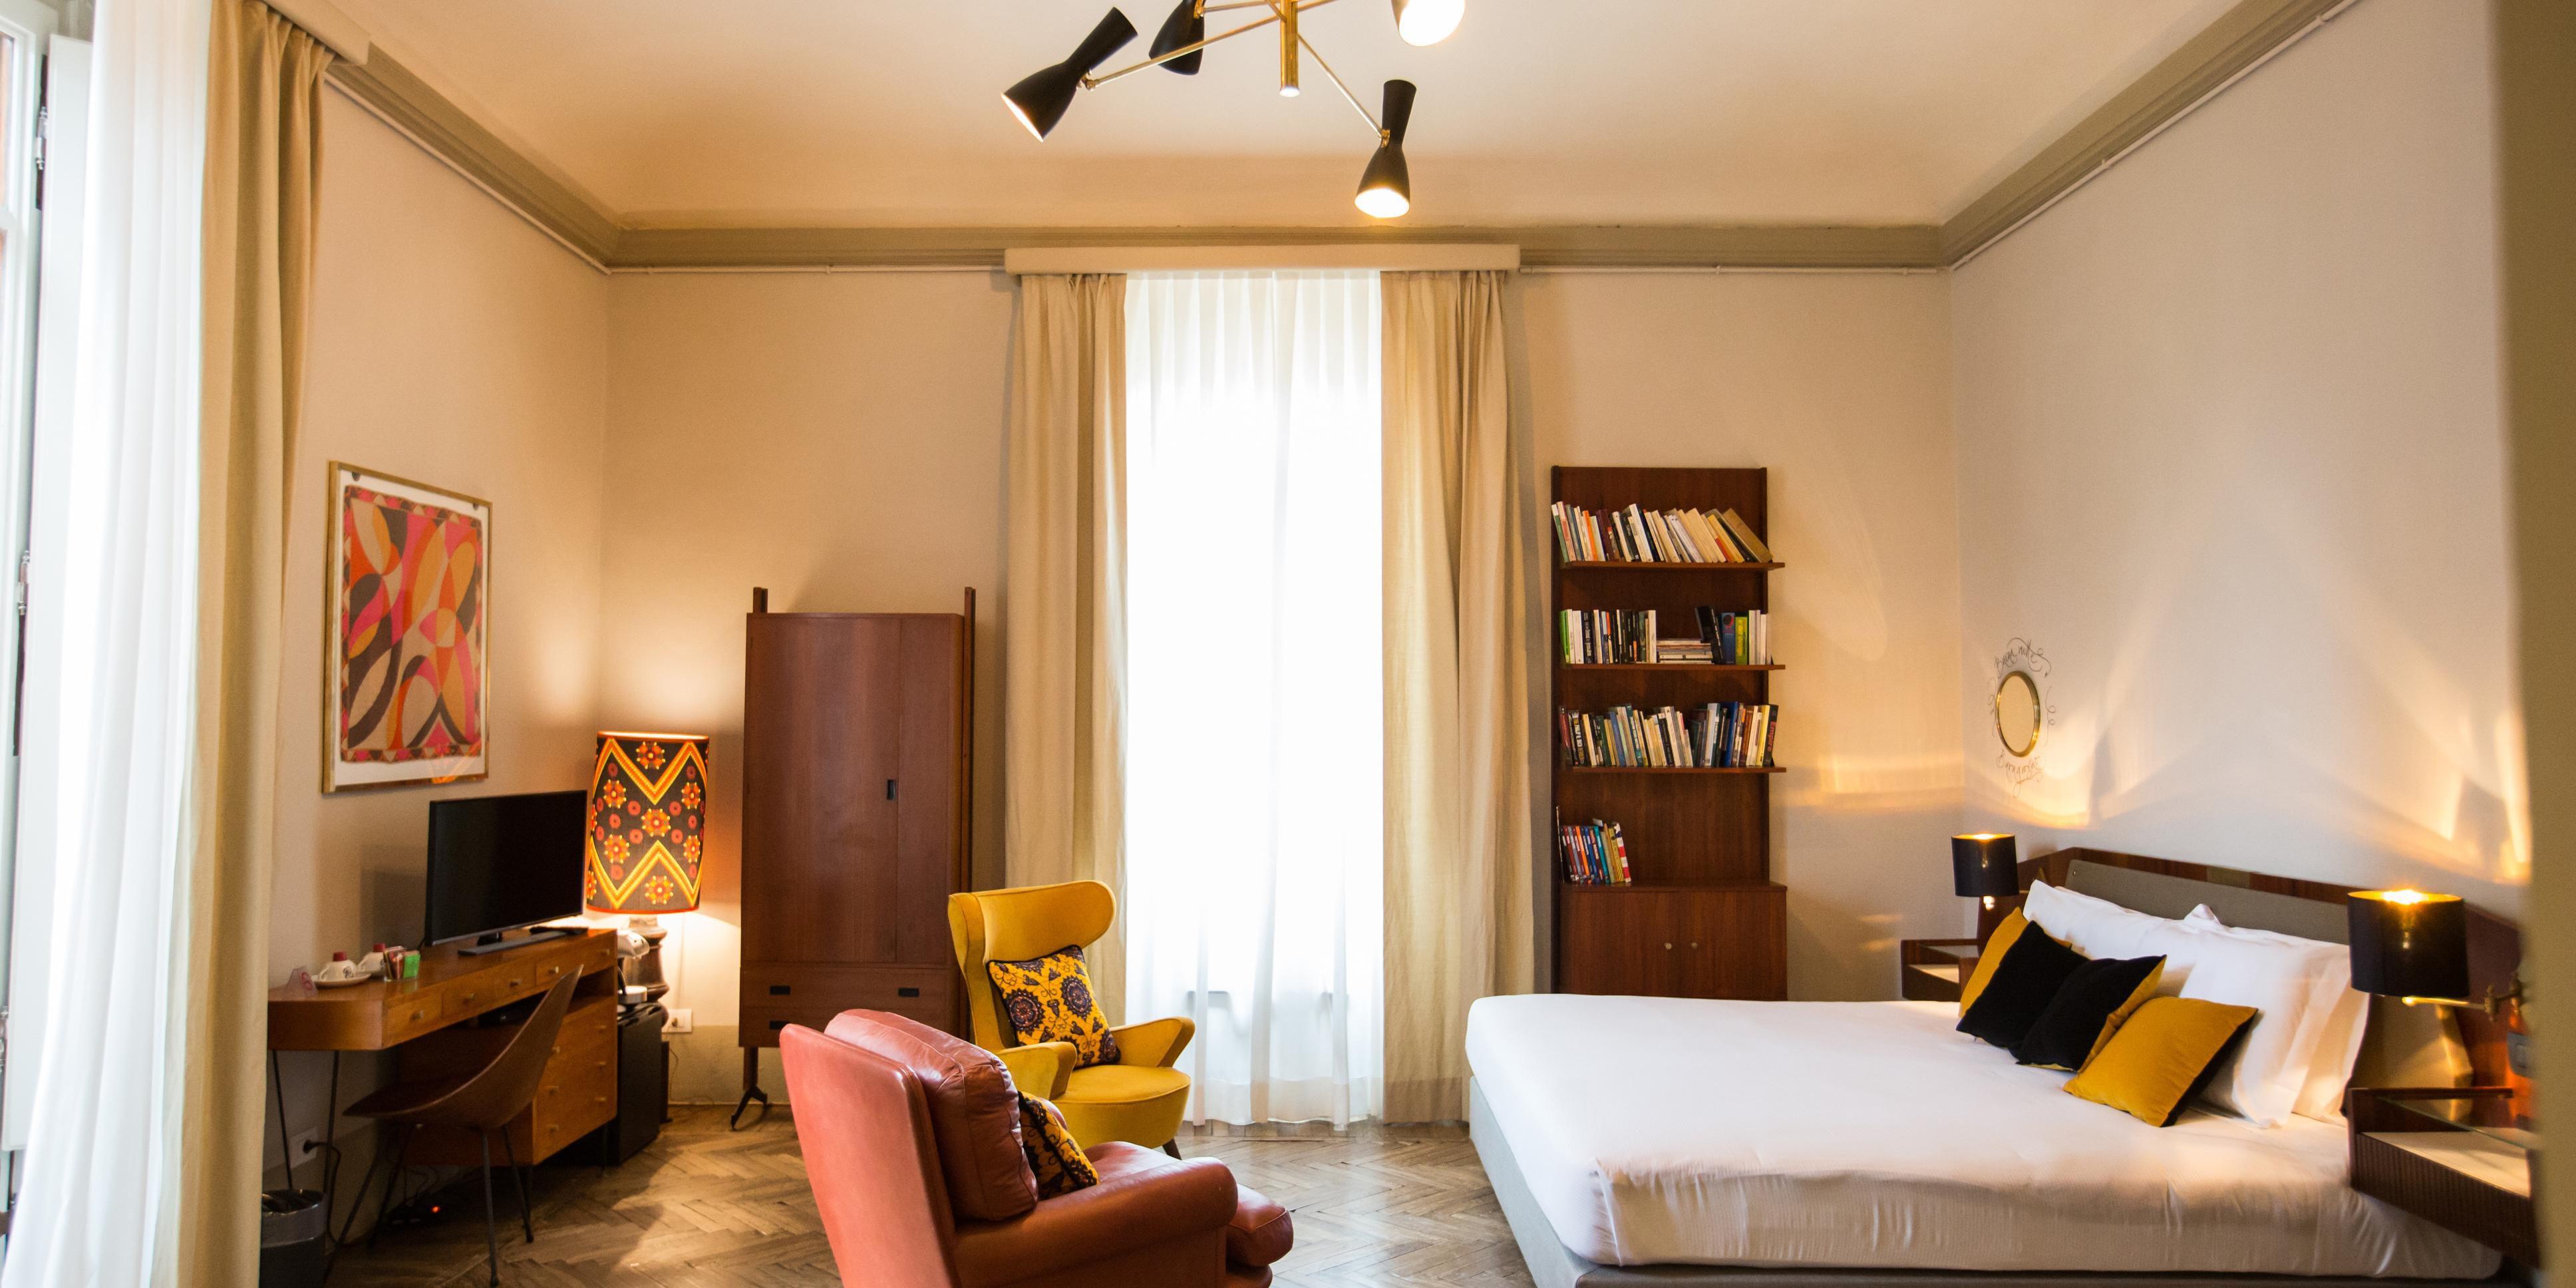 King with Balcony bedroom